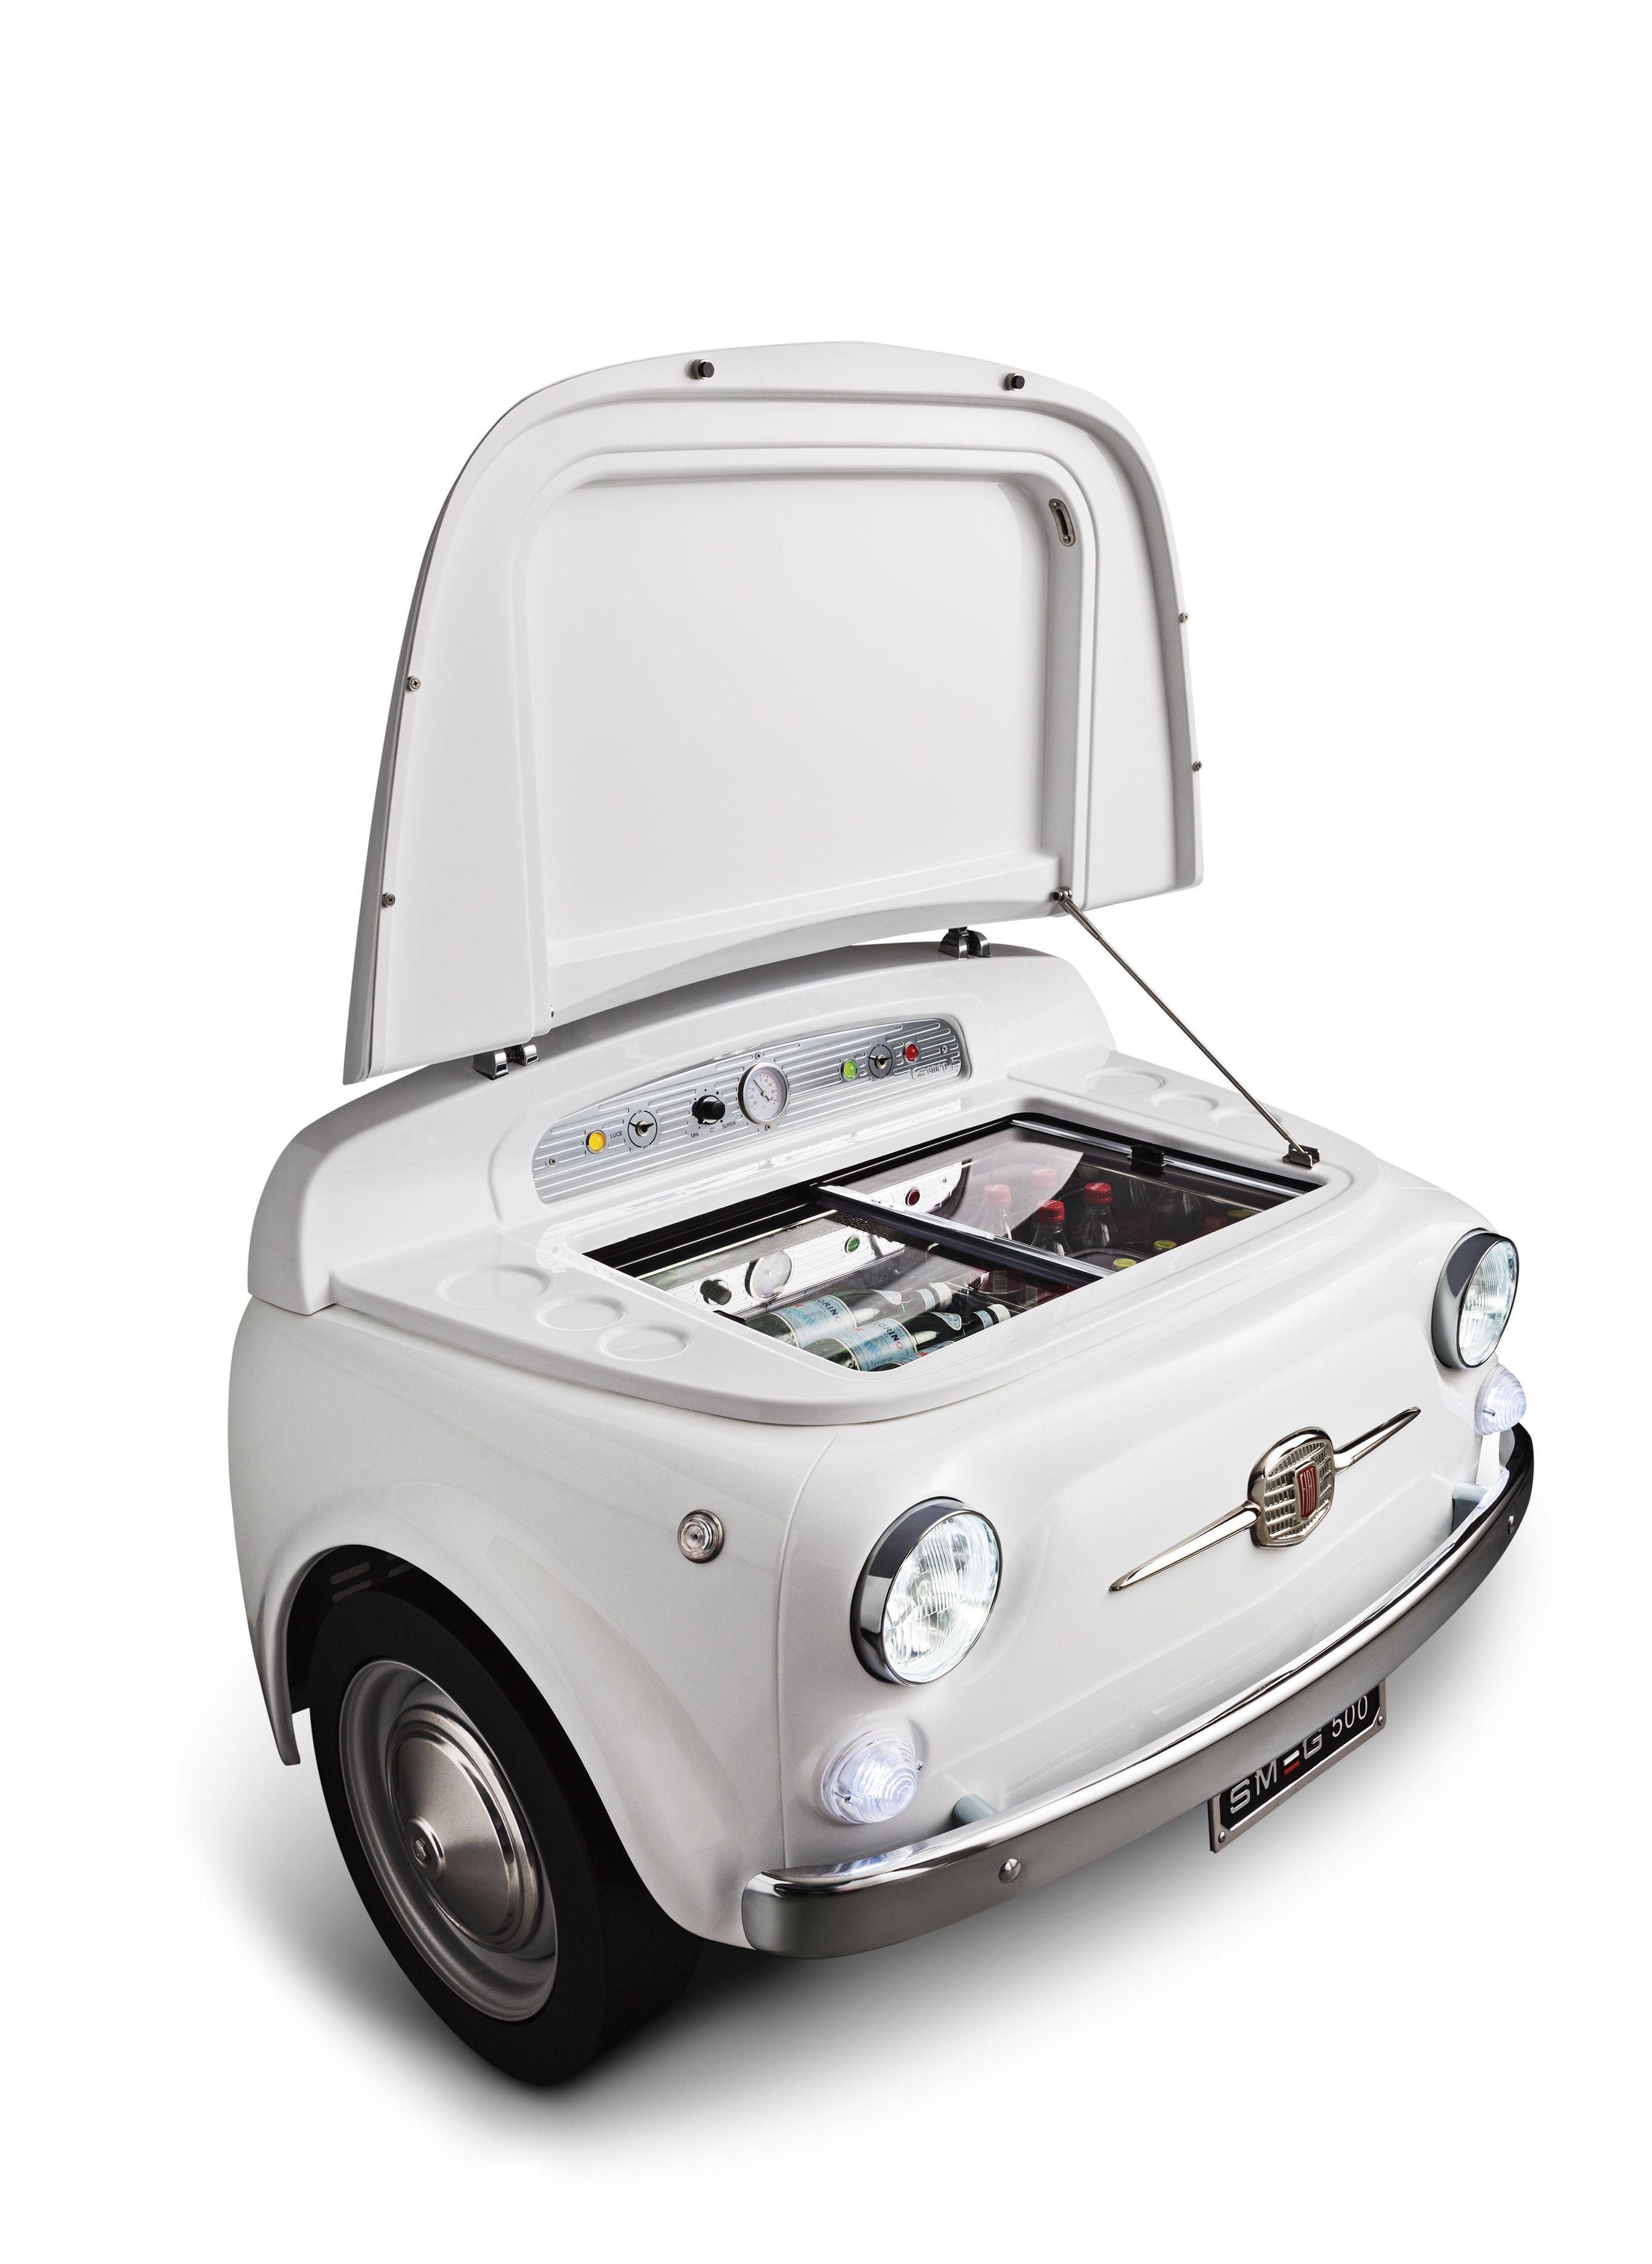 Smeg500b Exclusive Fiat500 Design Refrigerator Cellar White